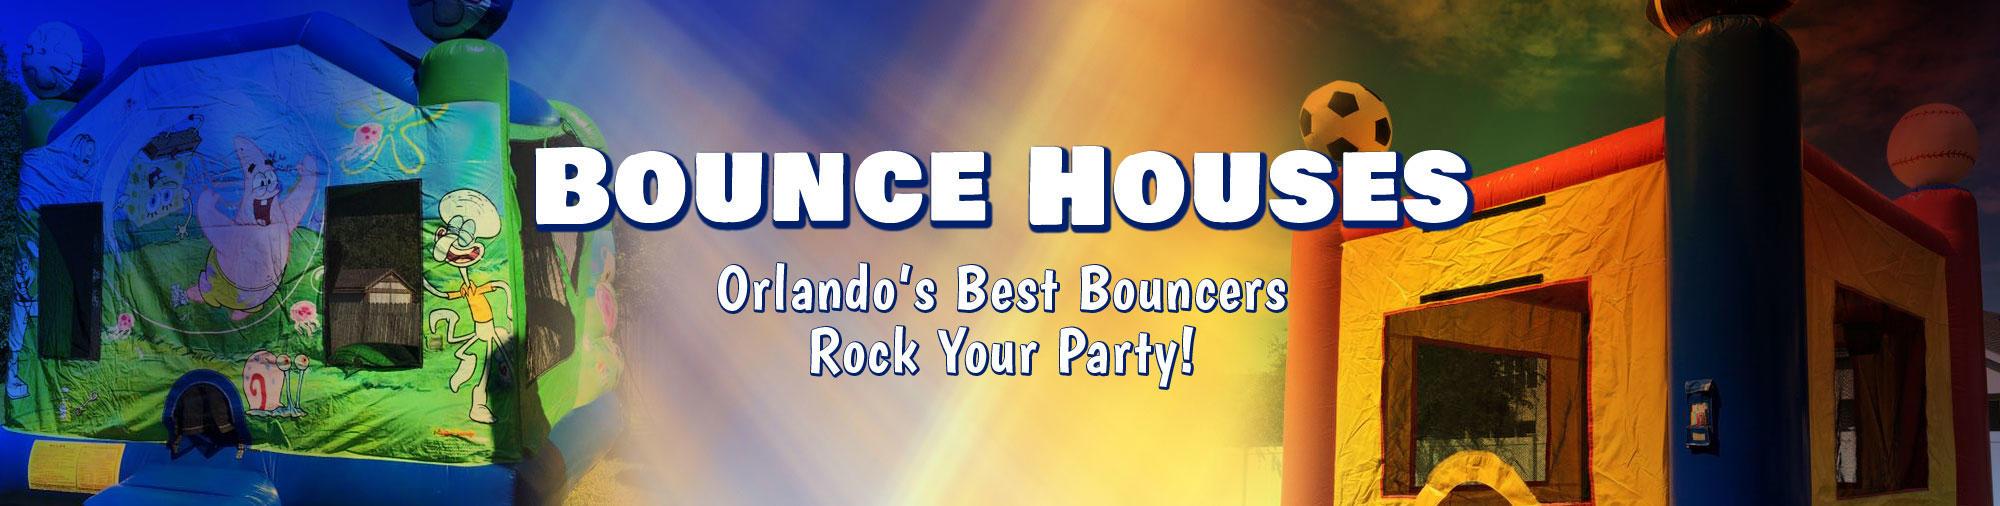 bounce house rentals orlando